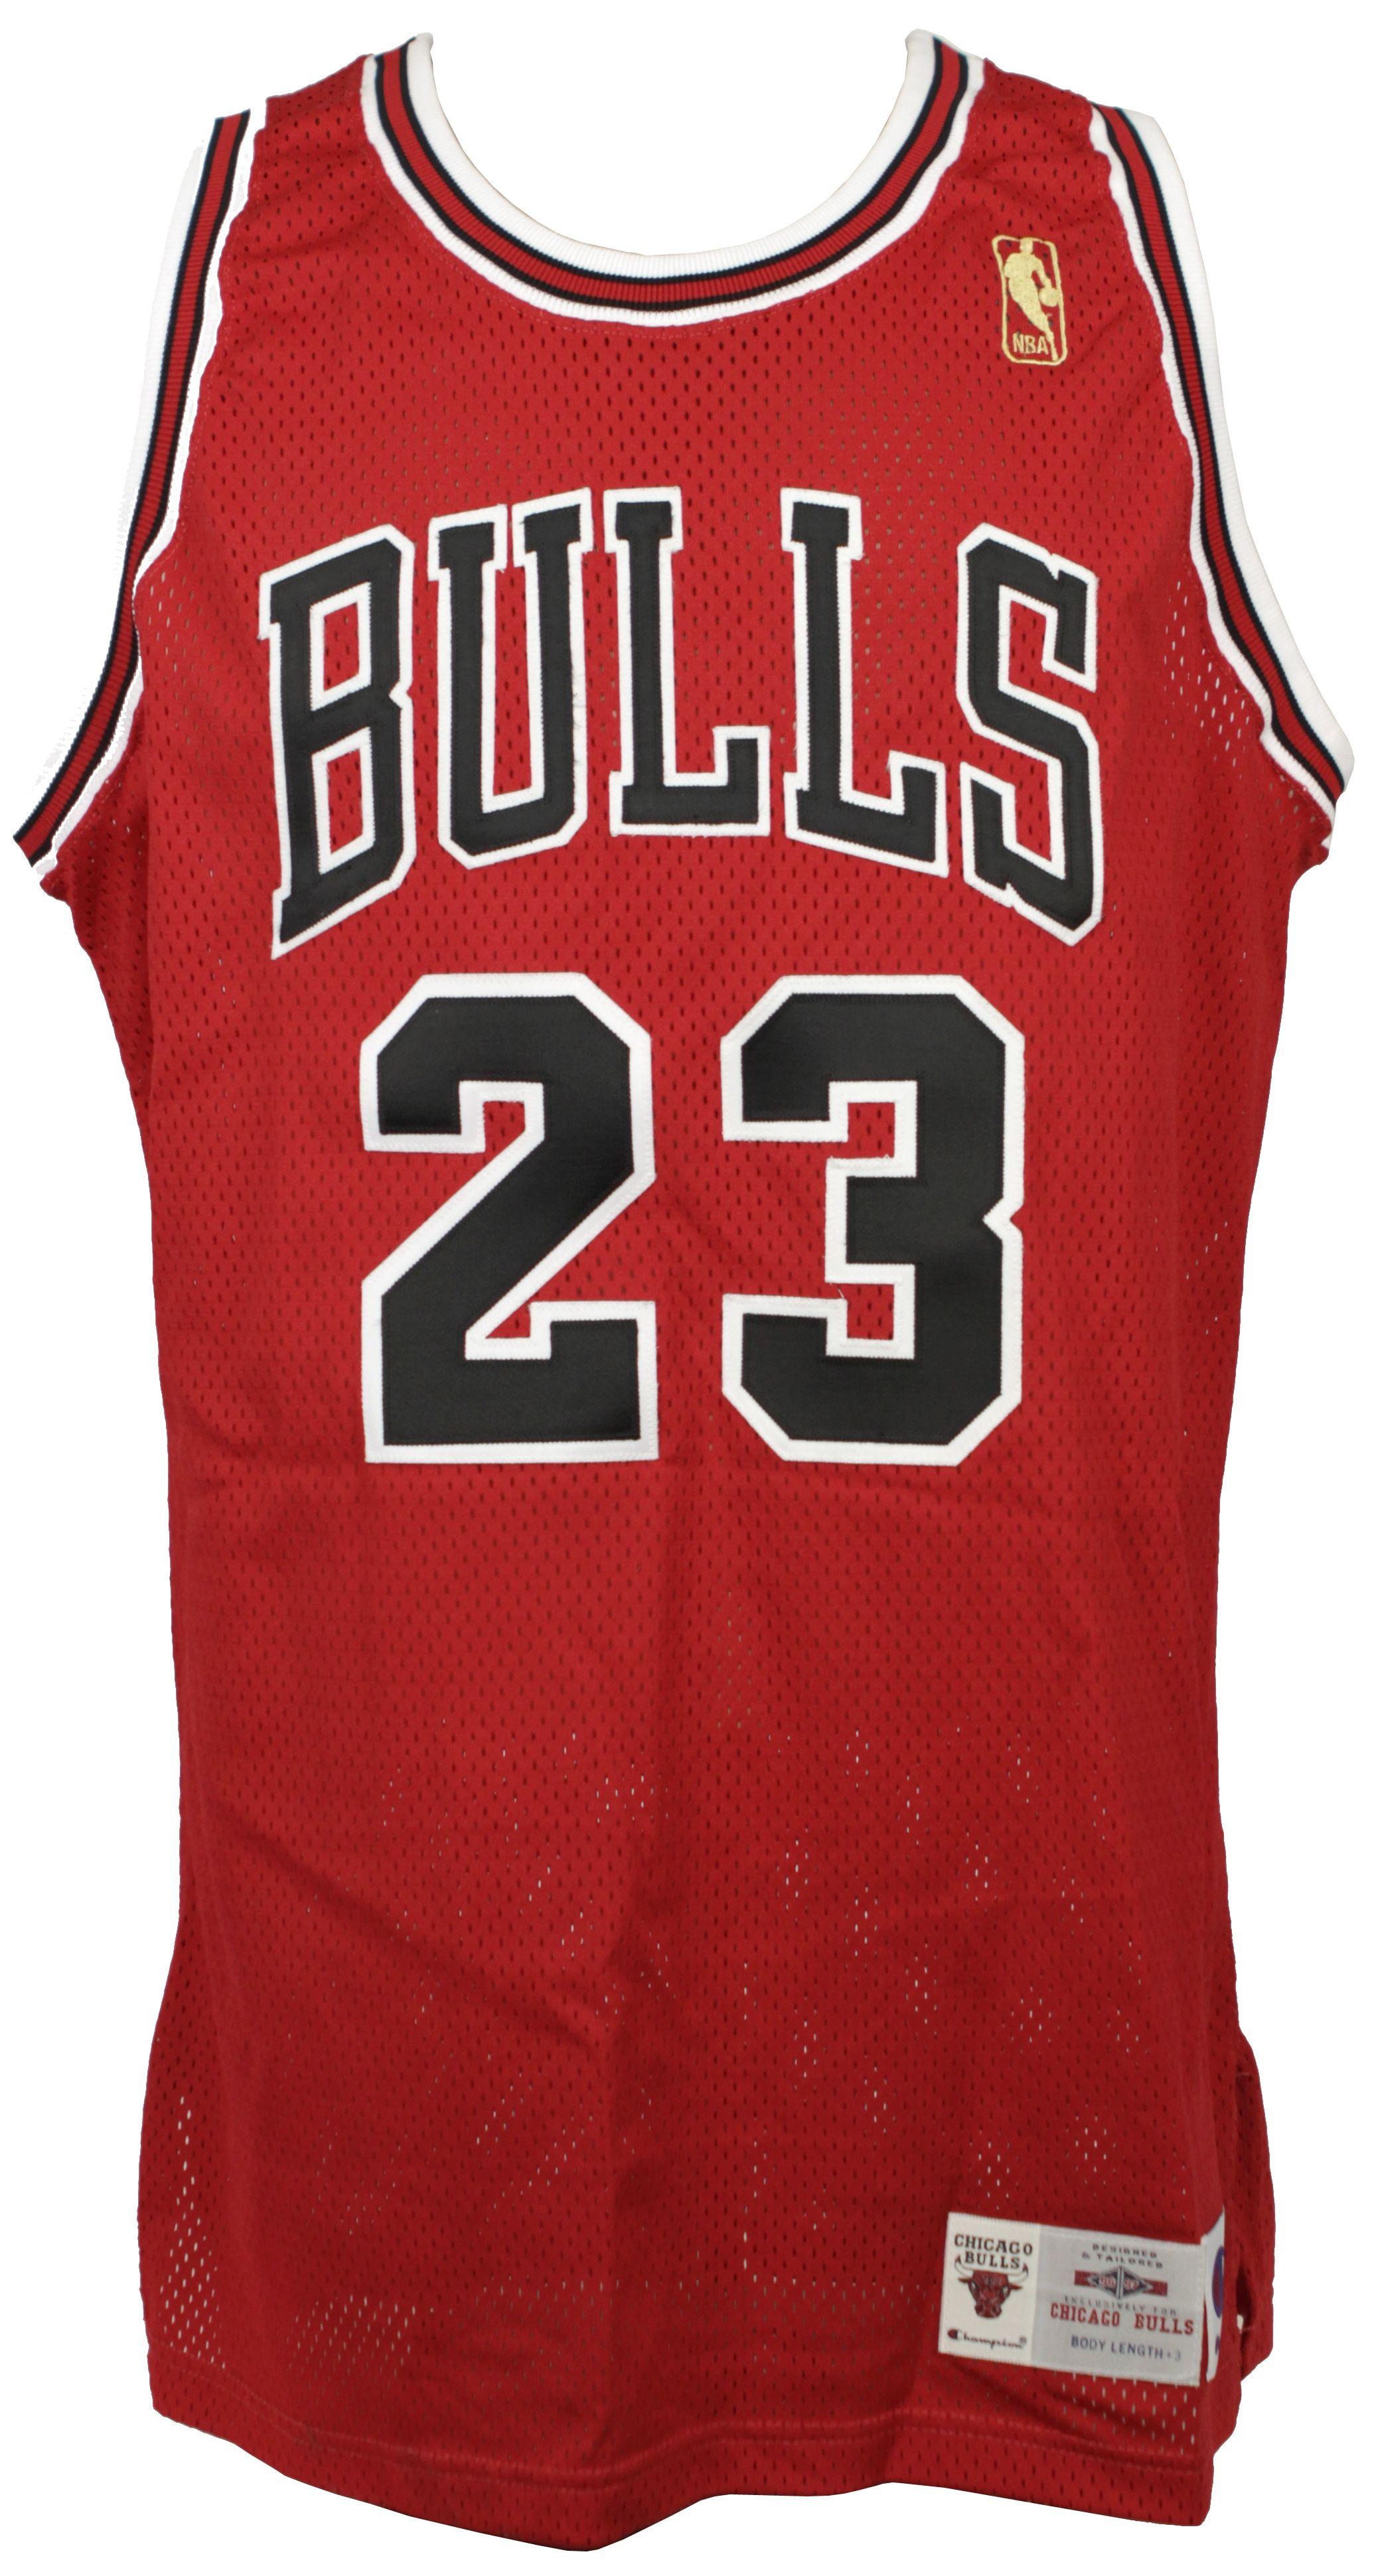 premium selection b129e 57d2f Lot Detail - 1996-97 Michael Jordan Chicago Bulls Pro Cut ...